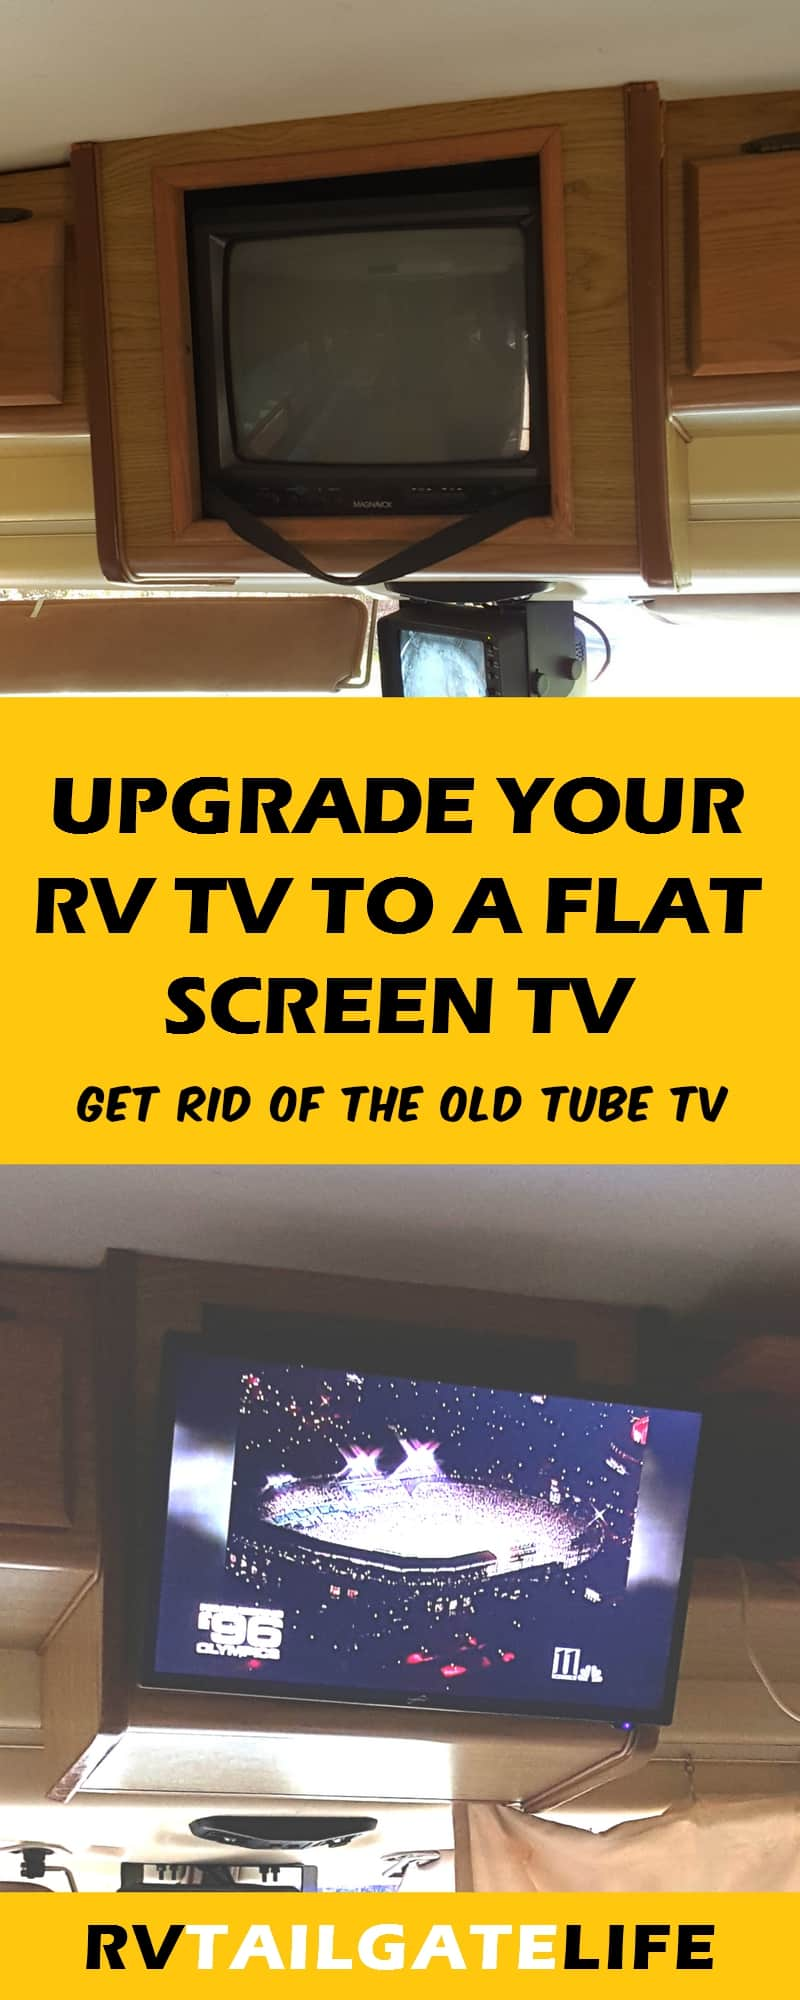 Upgrade to Digital Flatscreen TV - RV Tailgate Life